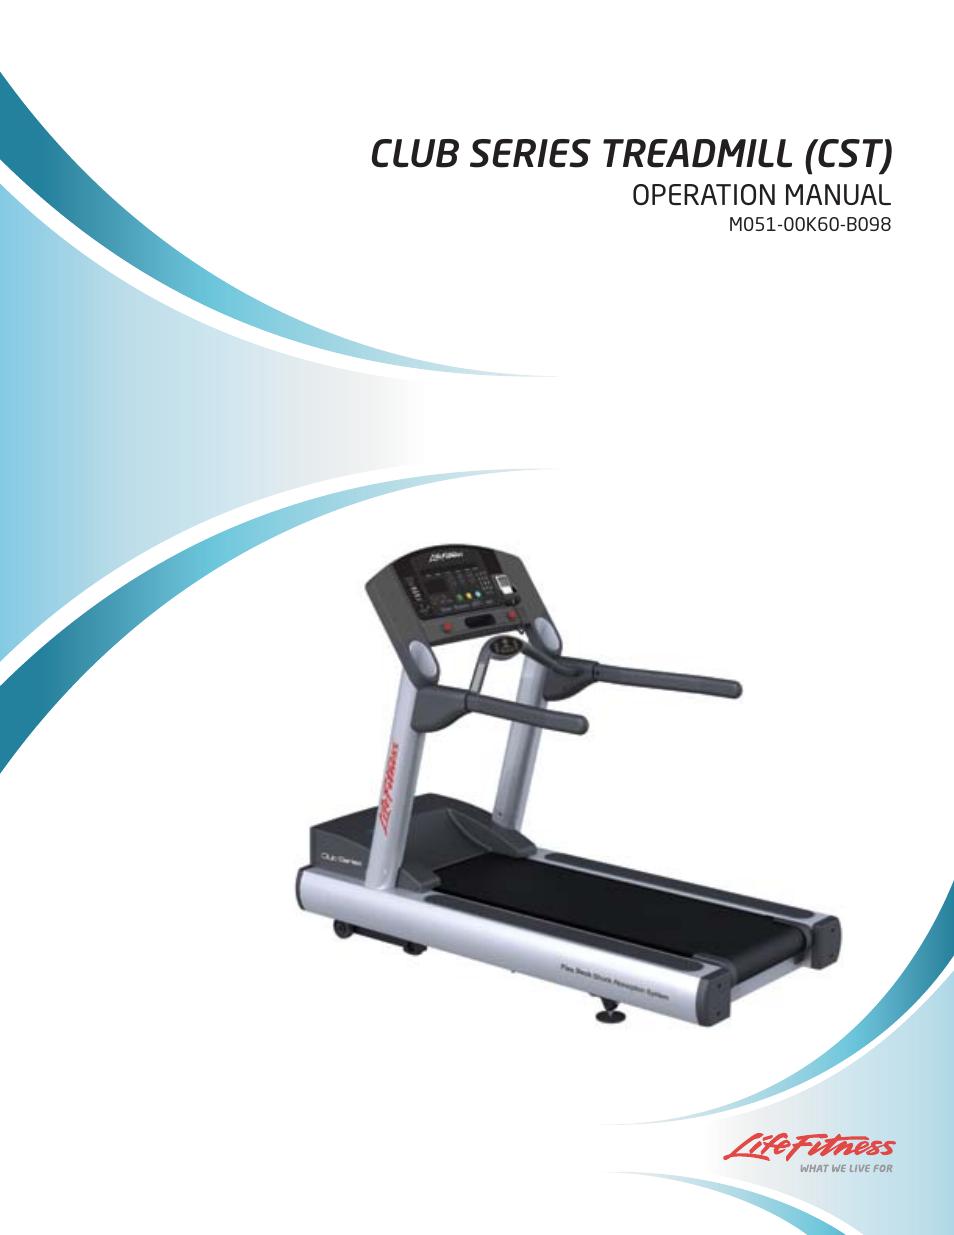 life fitness club series treadmill user manual 50 pages rh manualsdir com life fitness integrity series treadmill user manual life fitness treadmill manual 95t